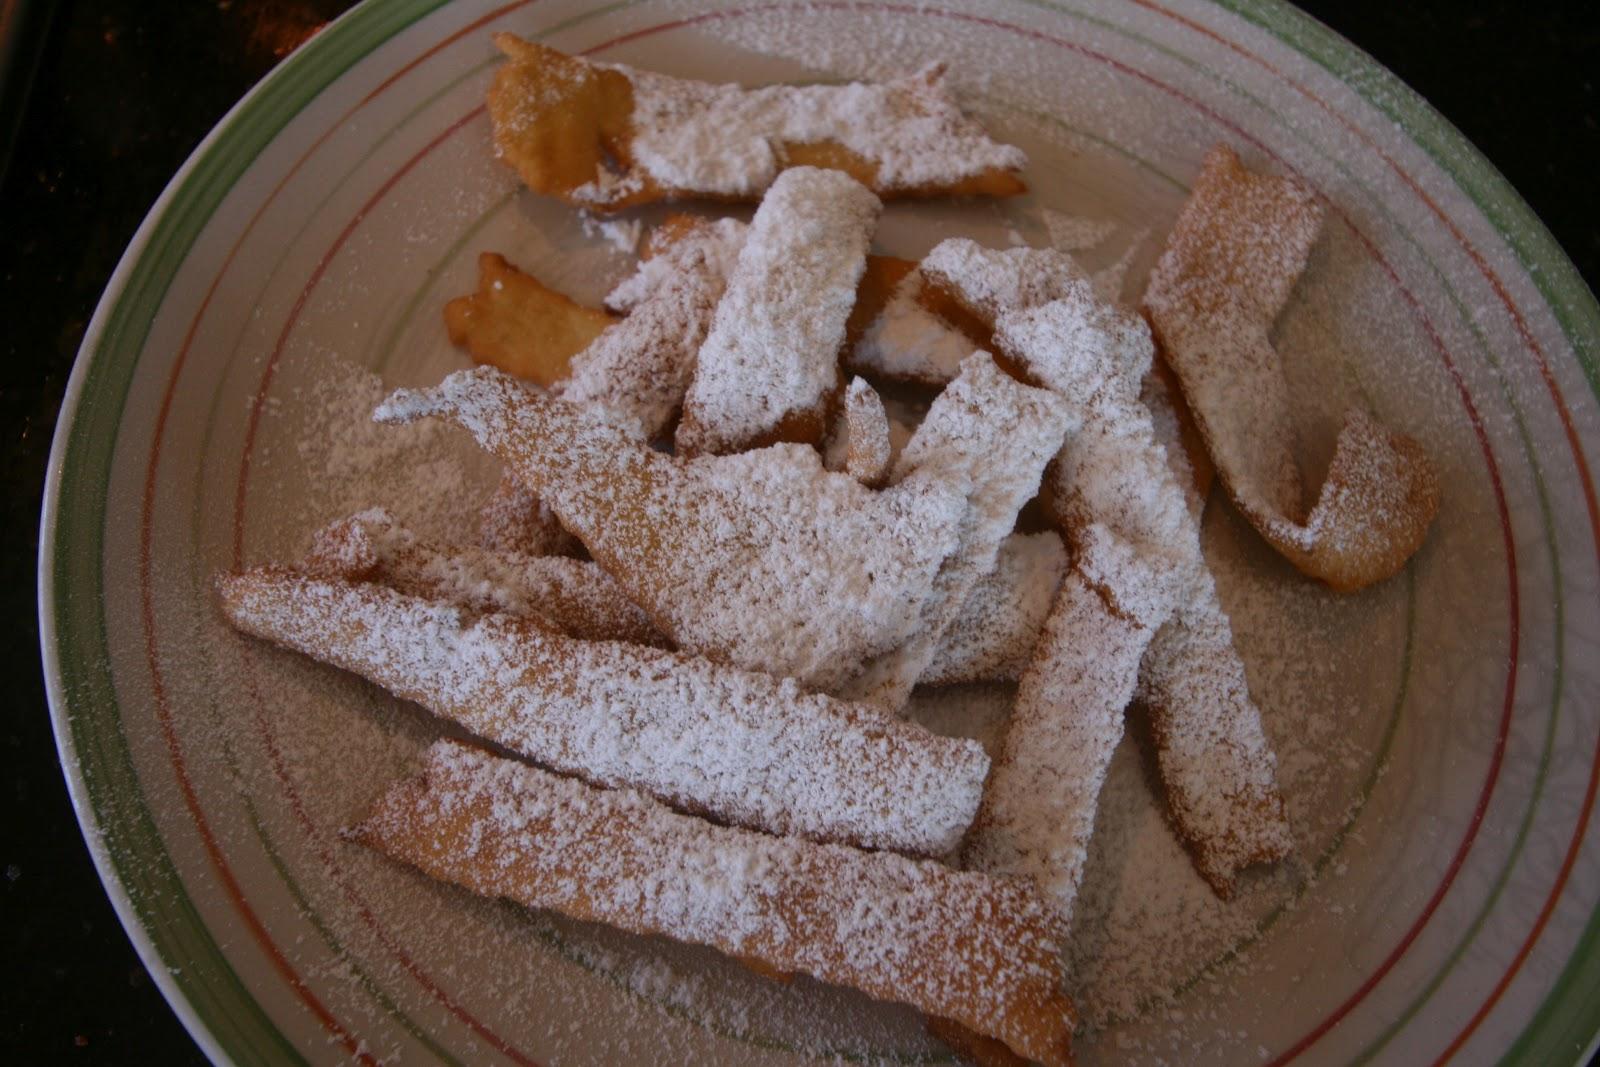 Bright Dinner Delights: Making Crostoli - The Easy Way